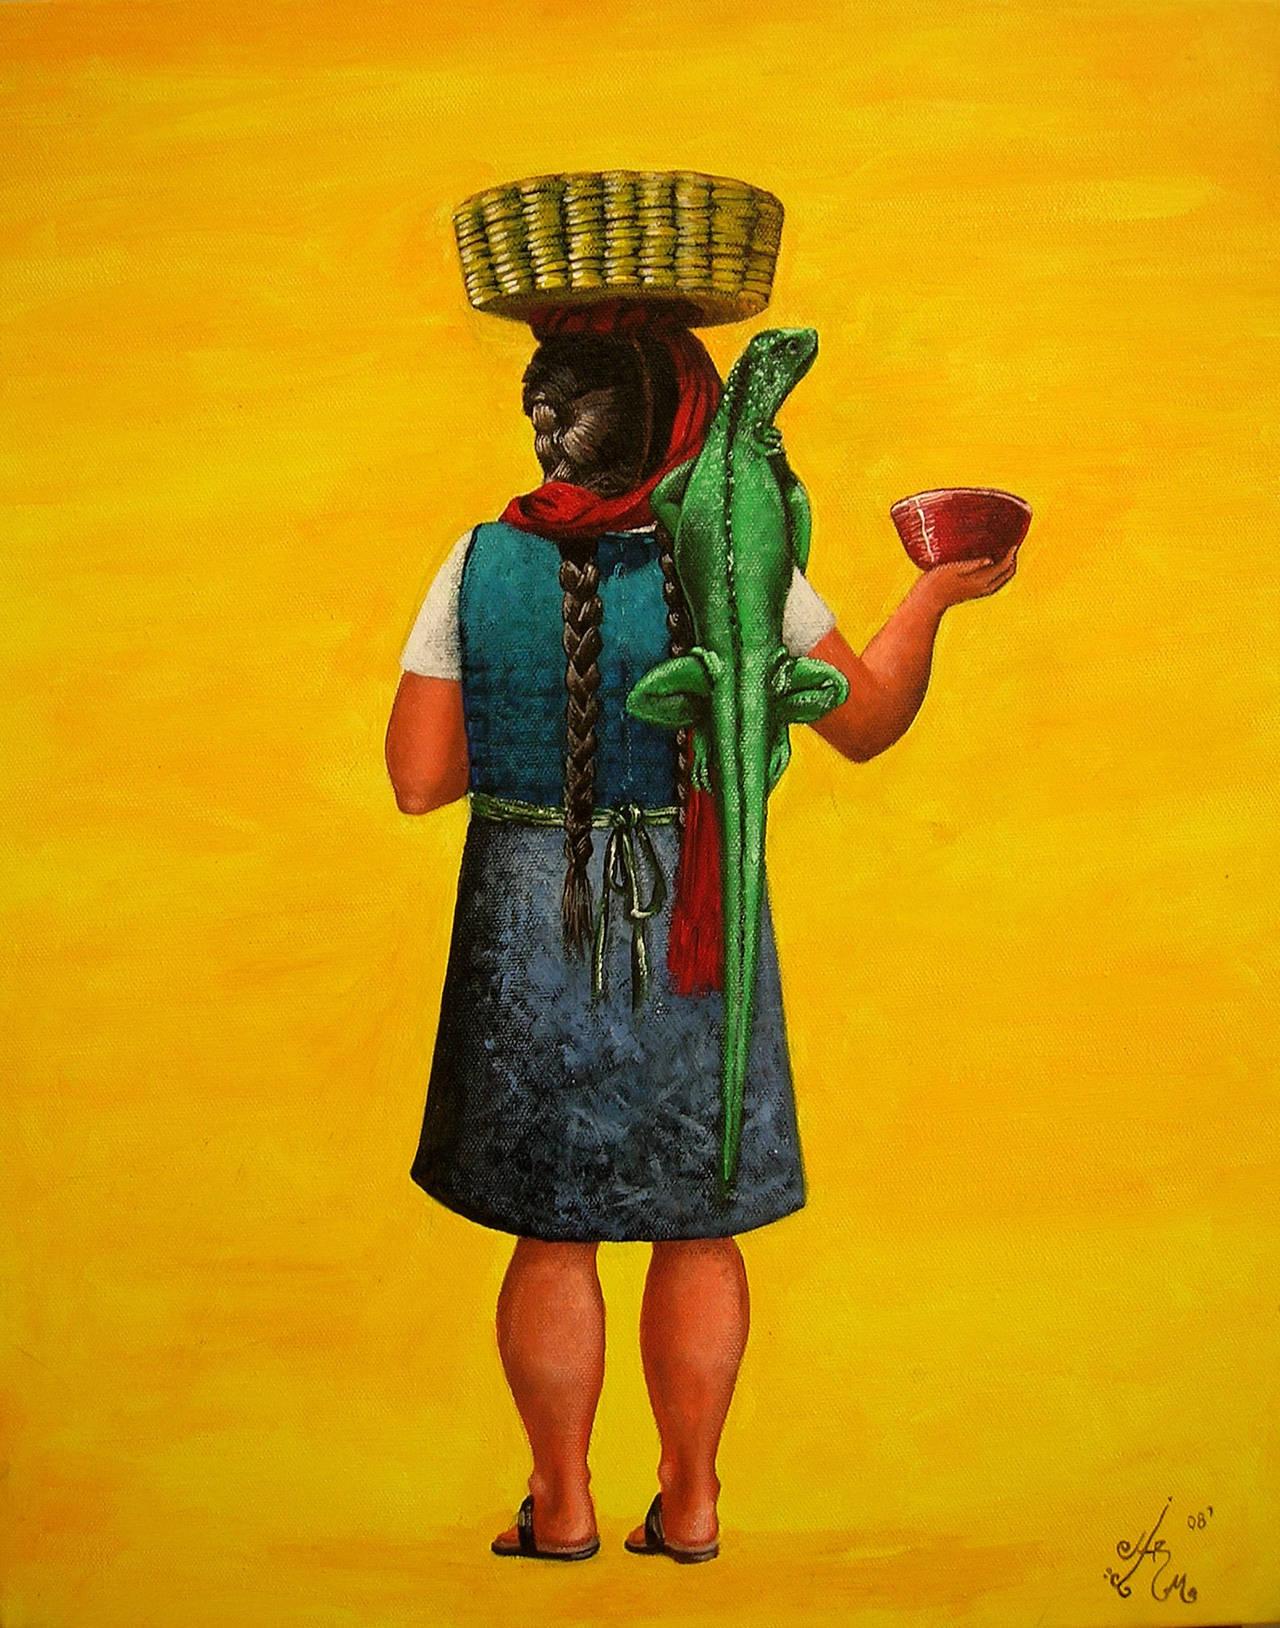 Margarita Hernandez Maxson